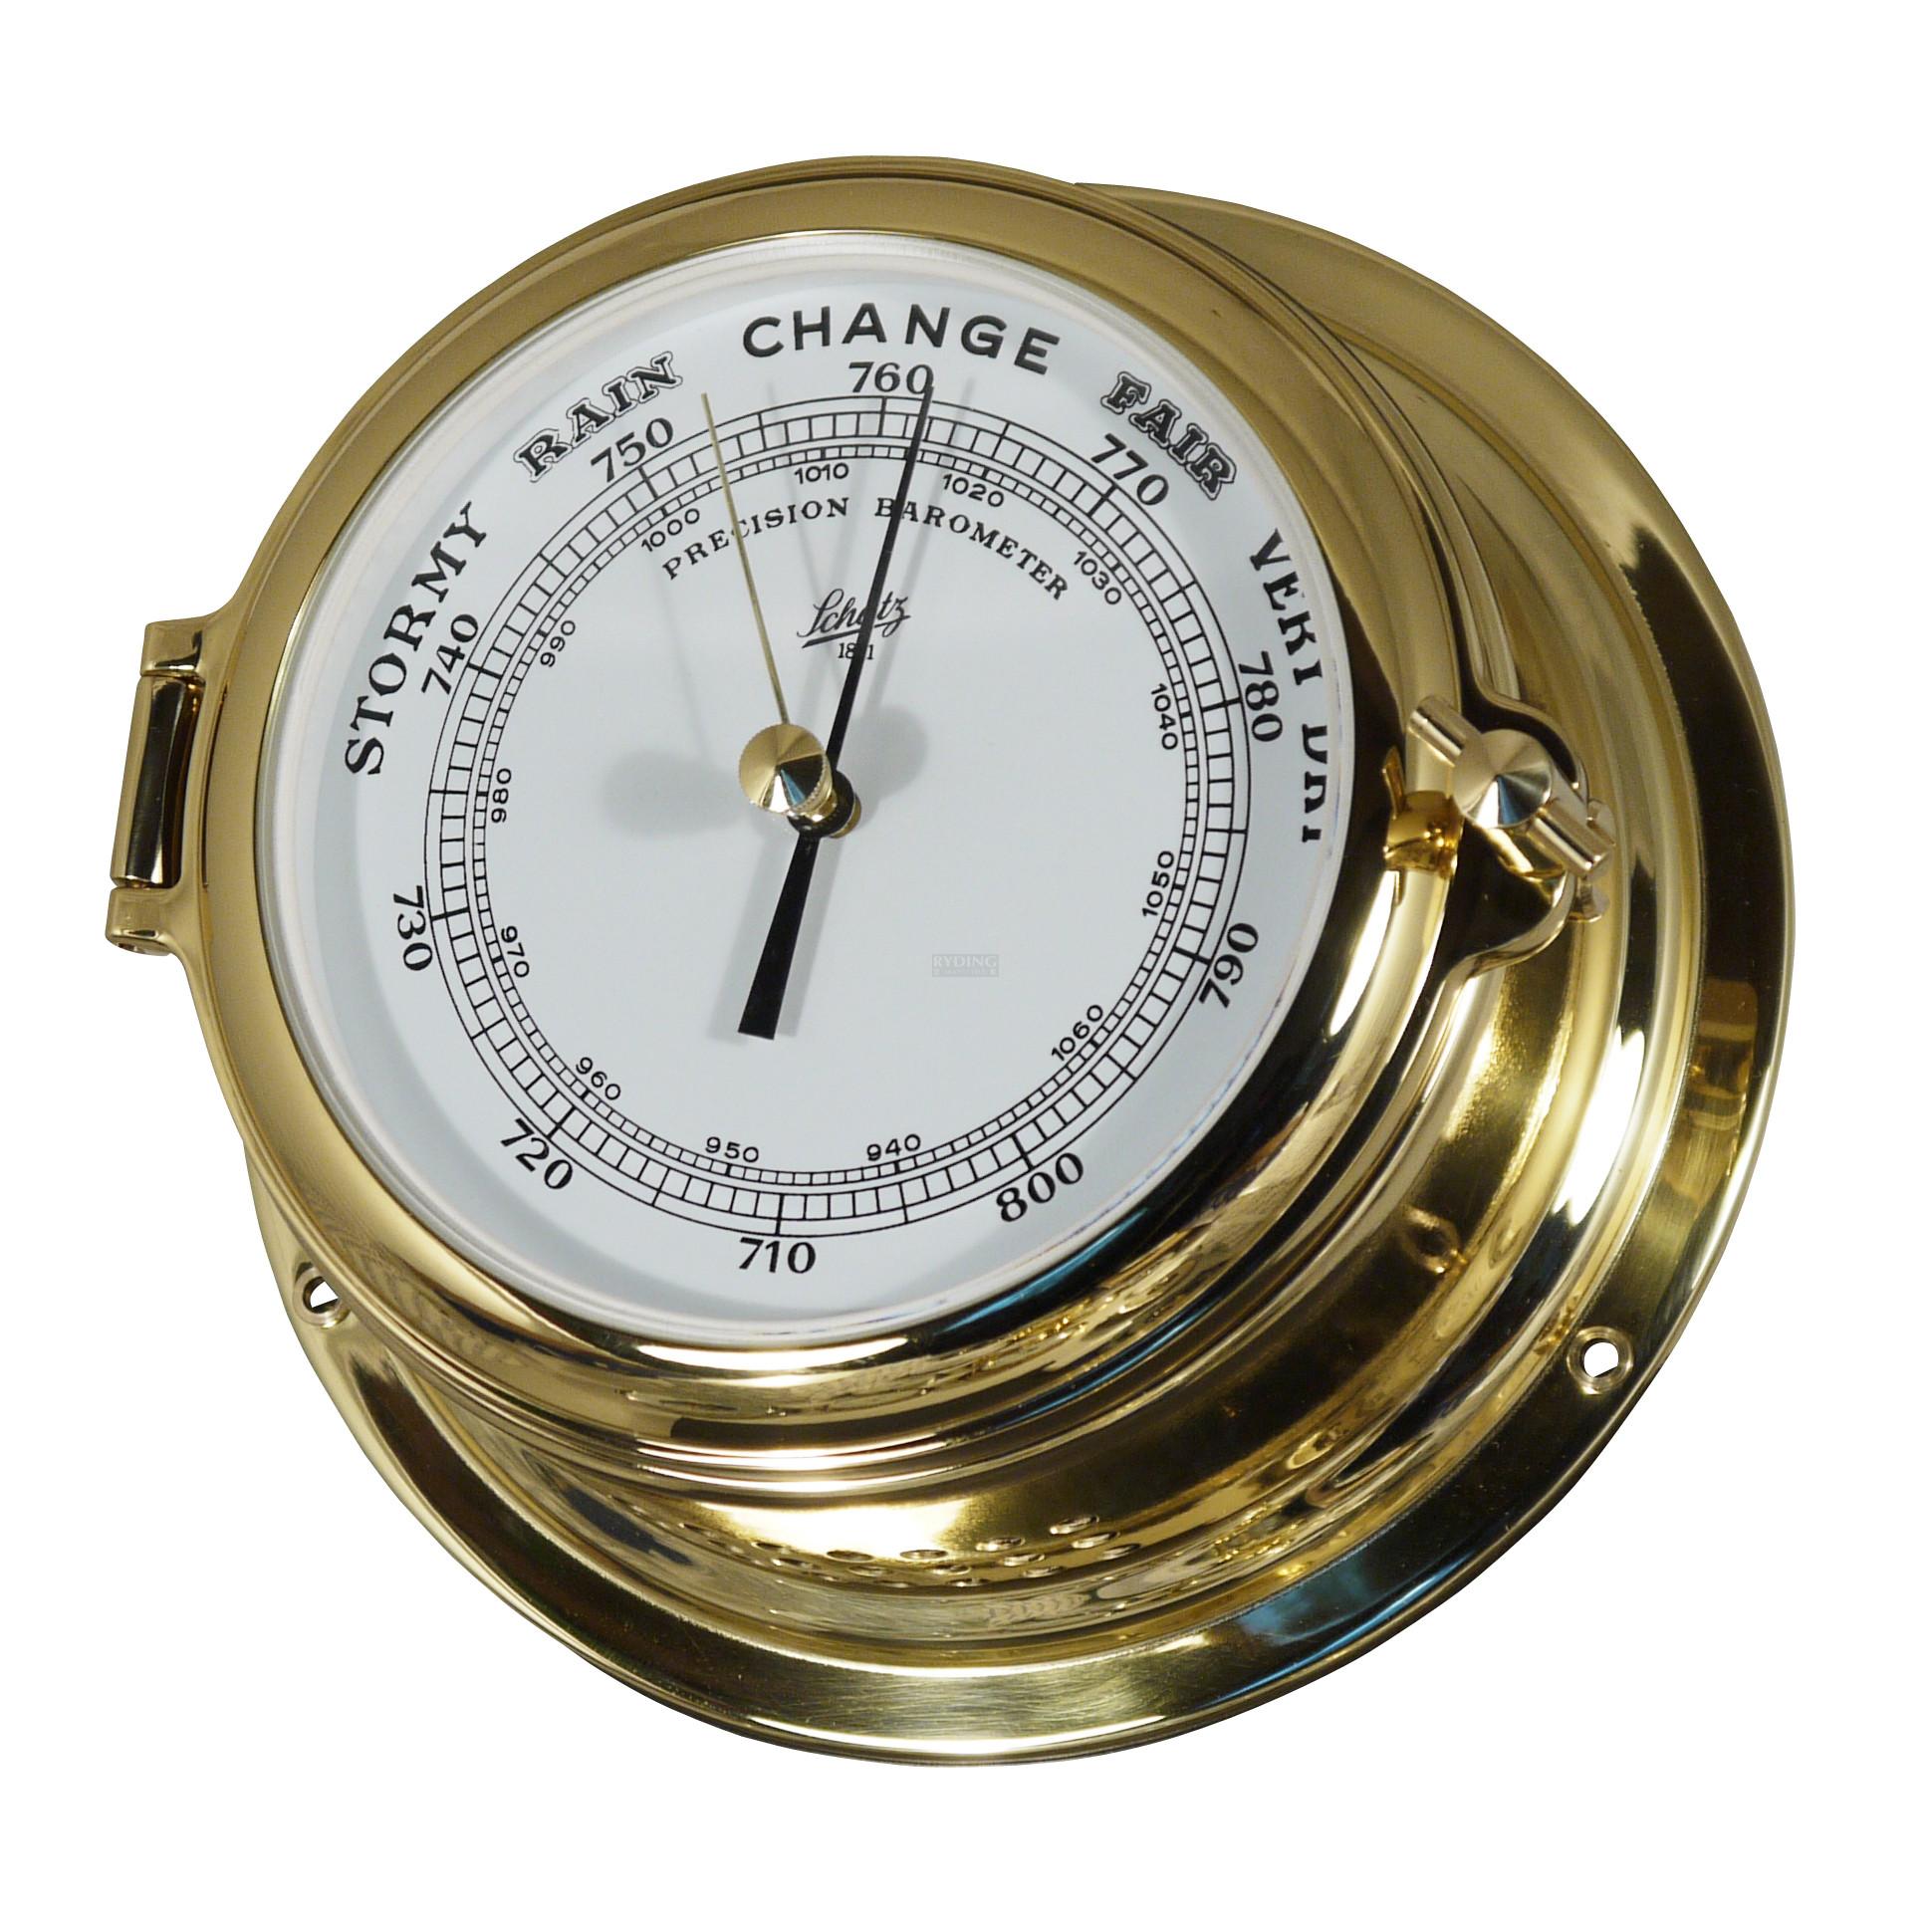 Schatz Barometer mm, Hg, hPa